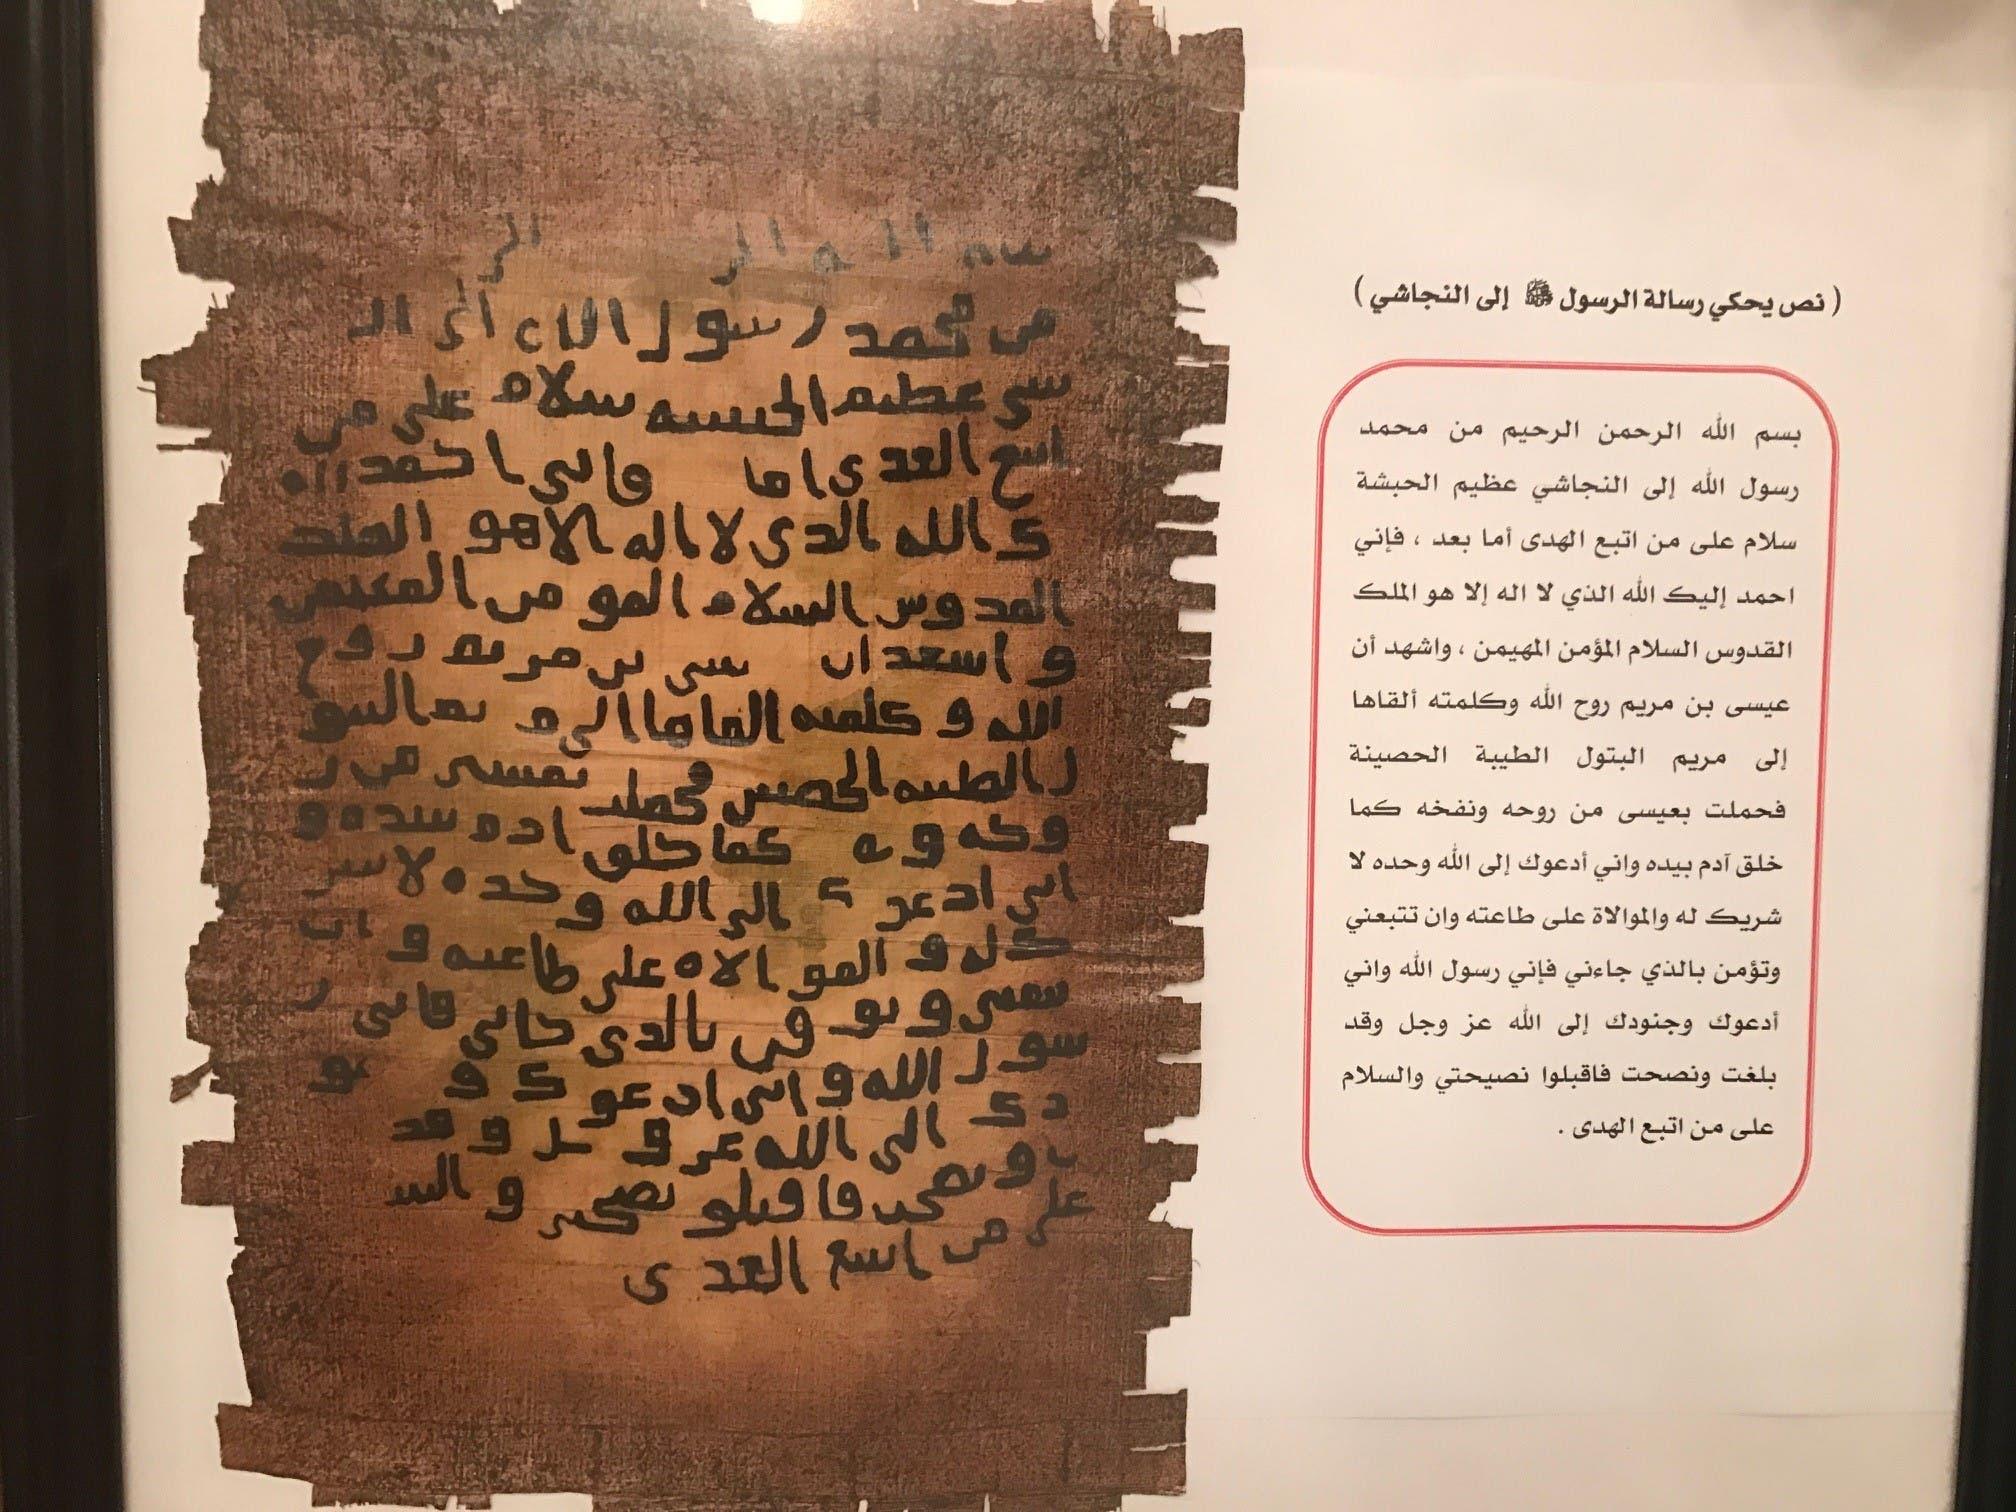 بالصور.. رسائل النبي محمد ملوك bd70bc31-7fd1-4bed-8